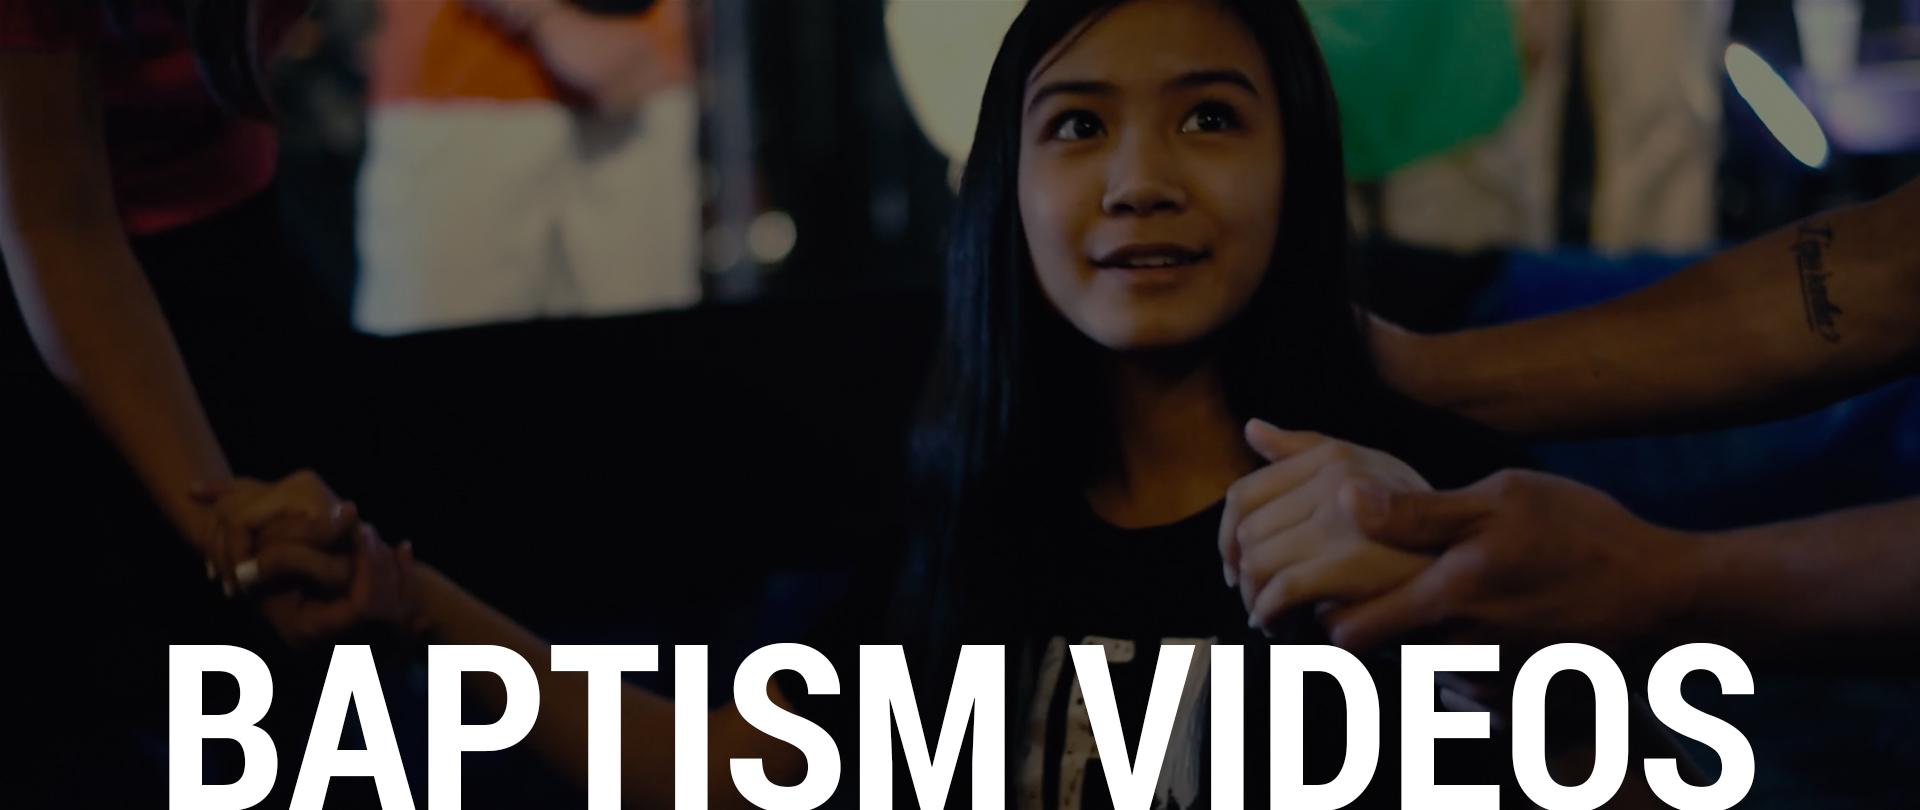 Baptism Videos